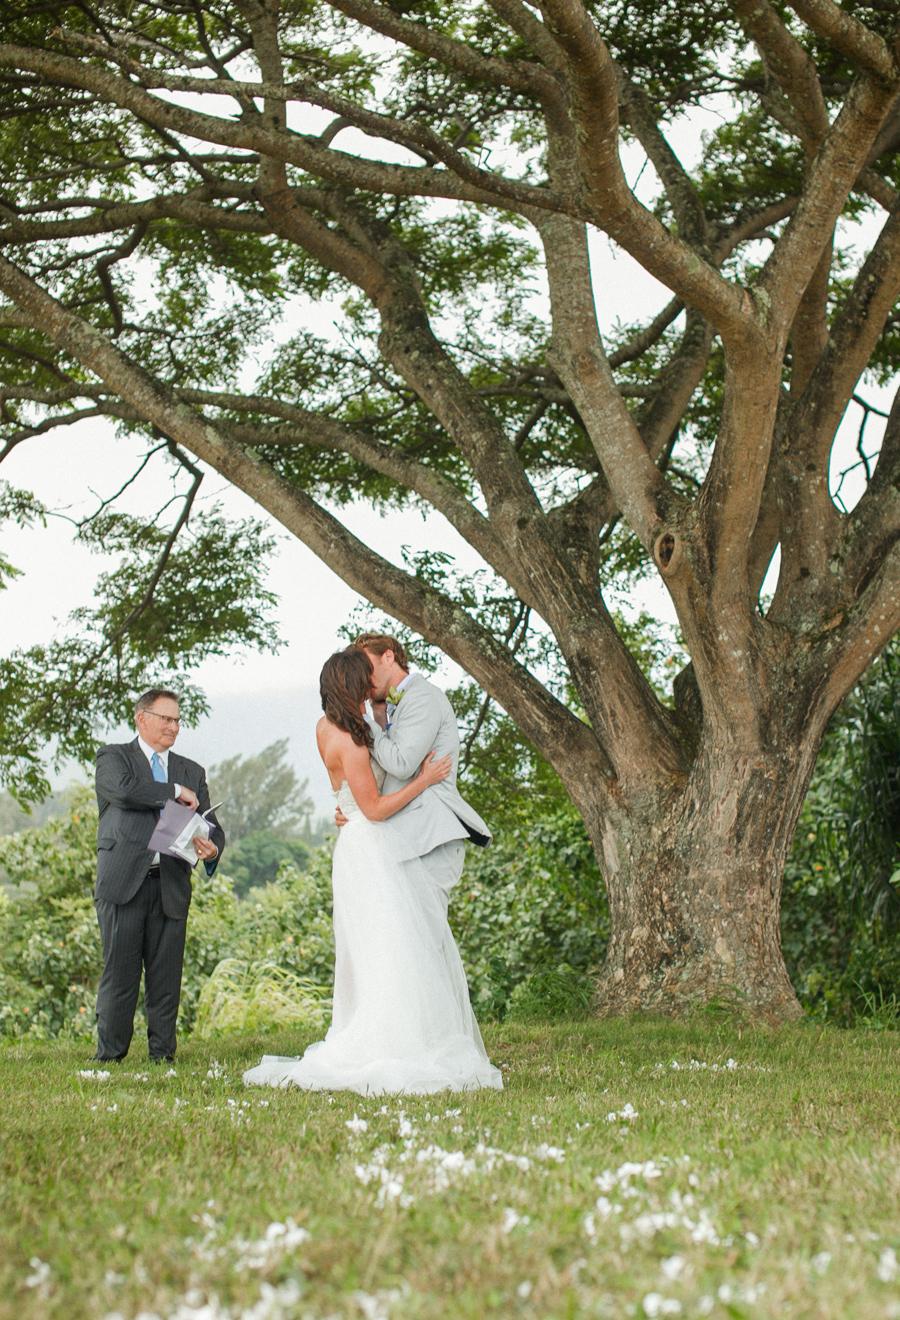 Romantic Kauai Wedding Ceremony